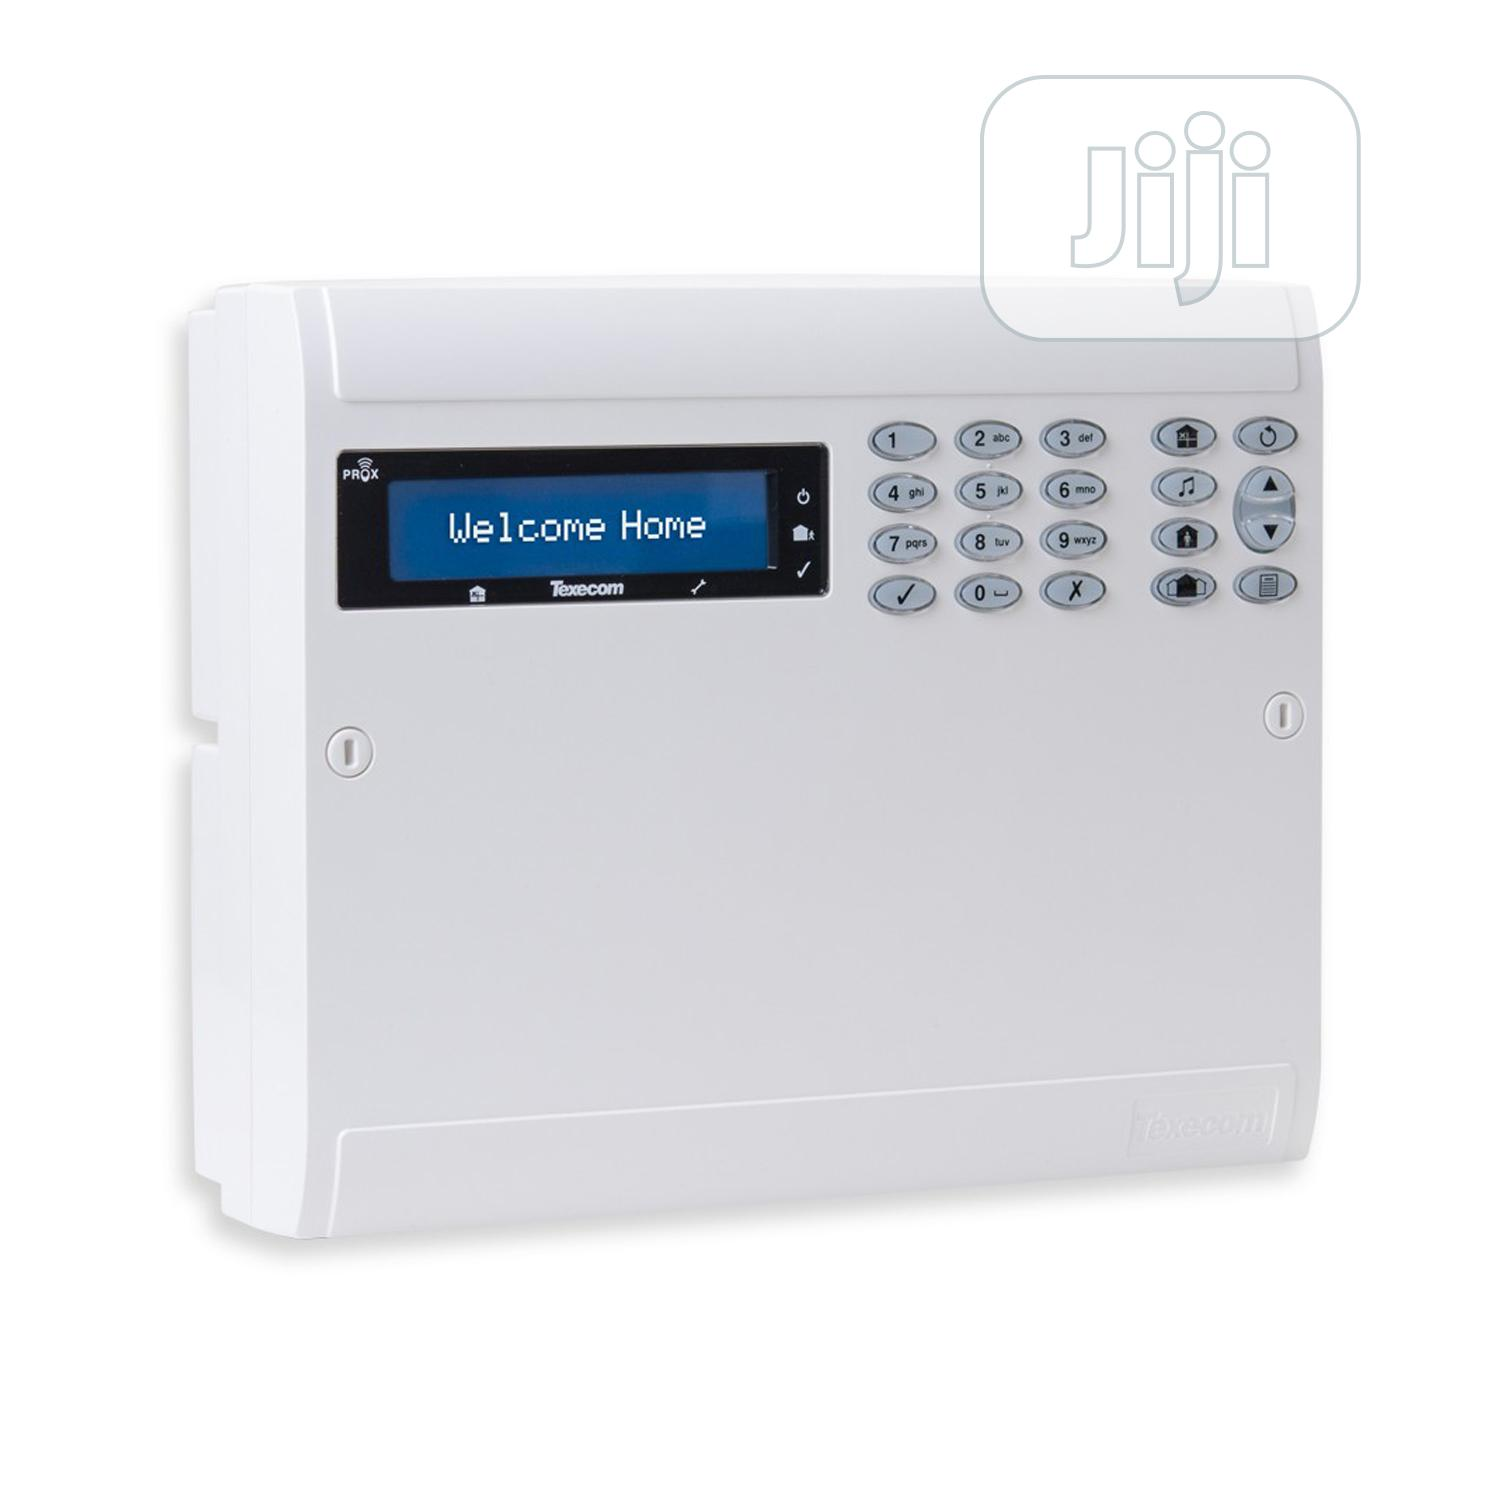 Archive: Burglary Alarm System - Texacom Premier Elite 64-W LIVE